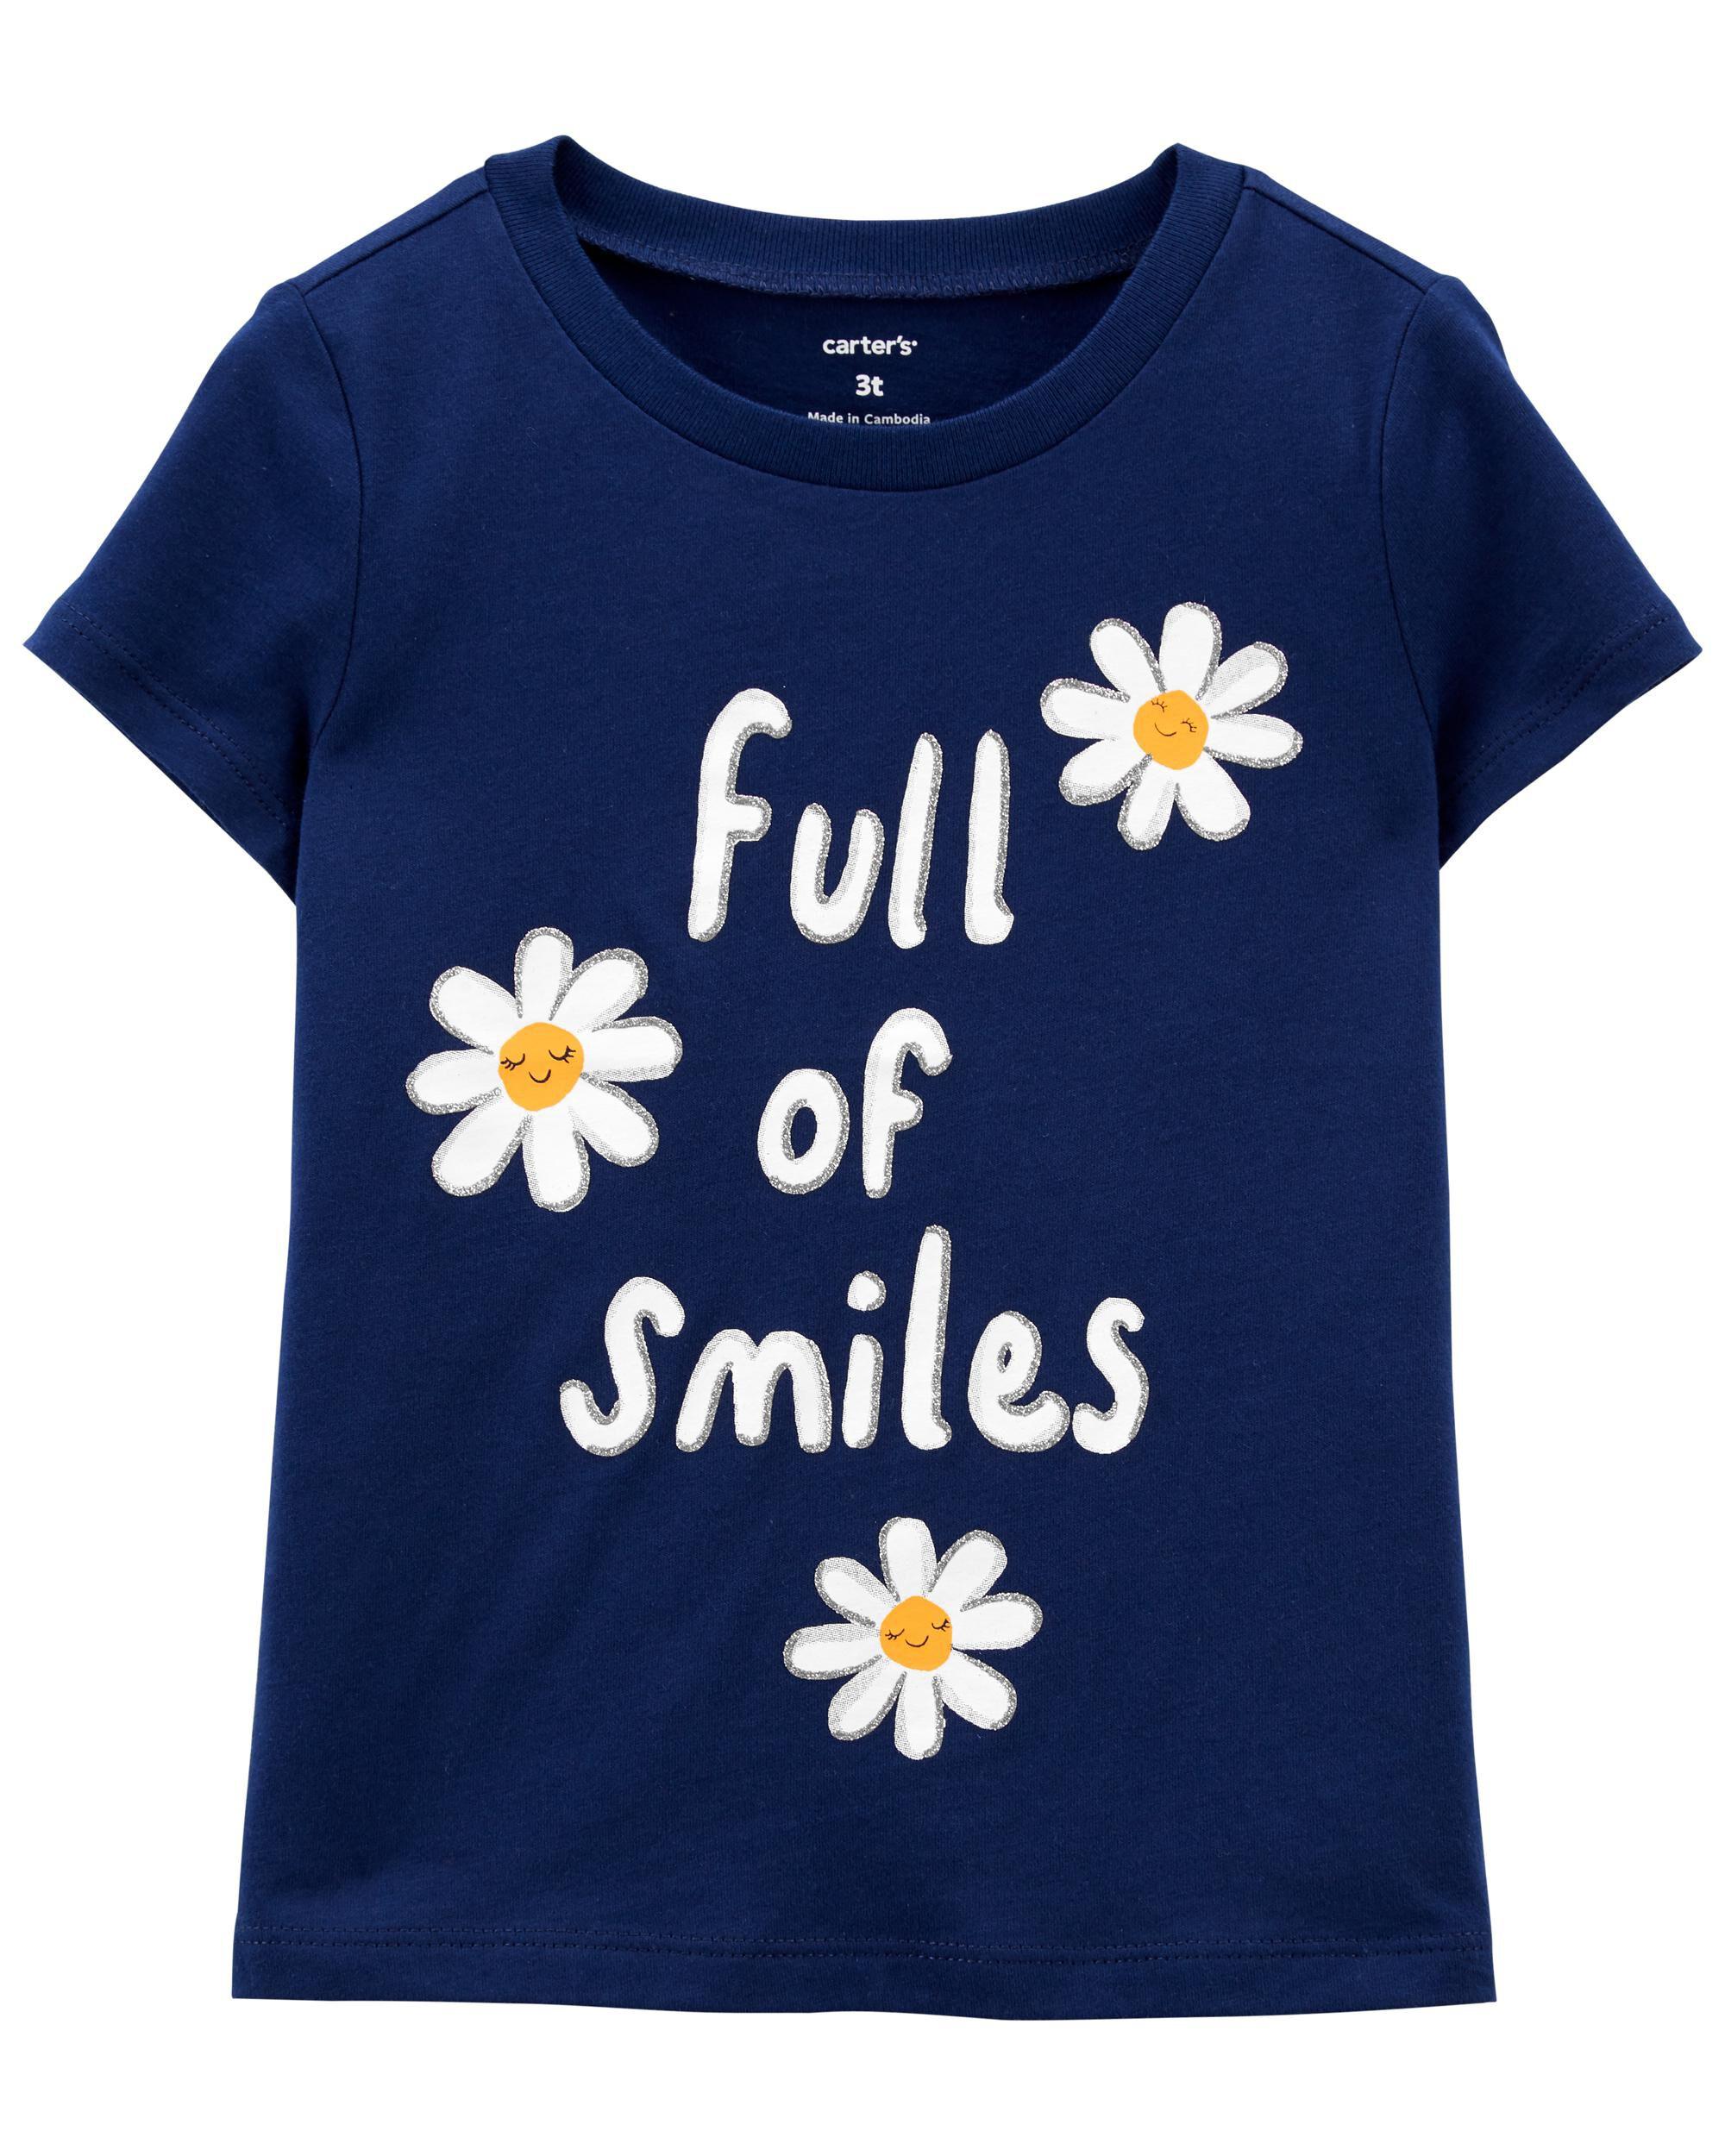 Oshkoshbgosh Full Of Smiles Daisy Jersey Tee